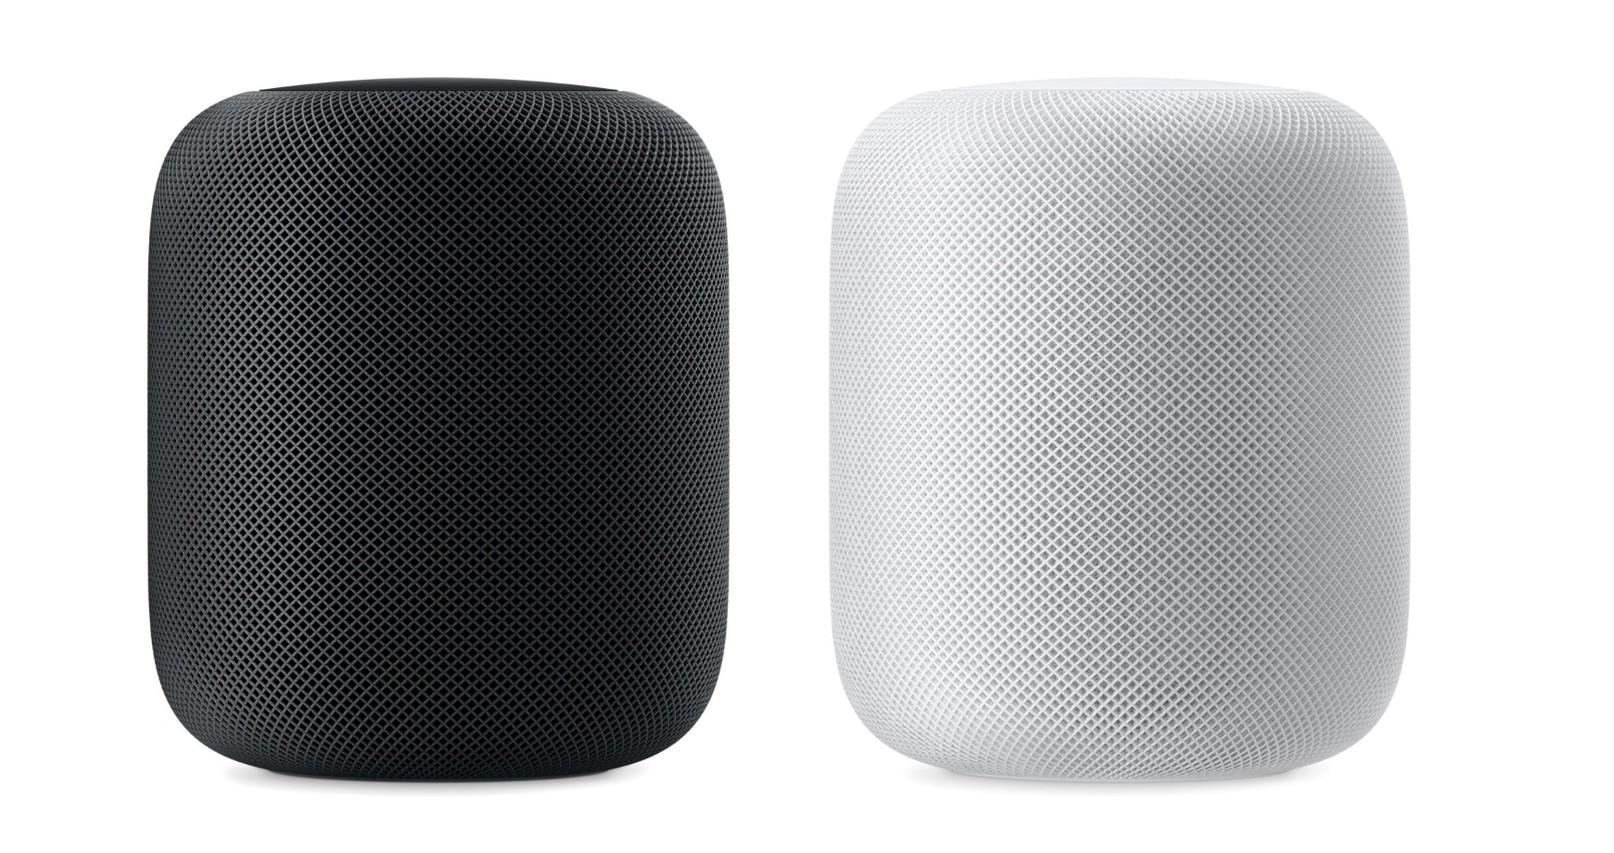 Apple to introduce $250 smart speaker